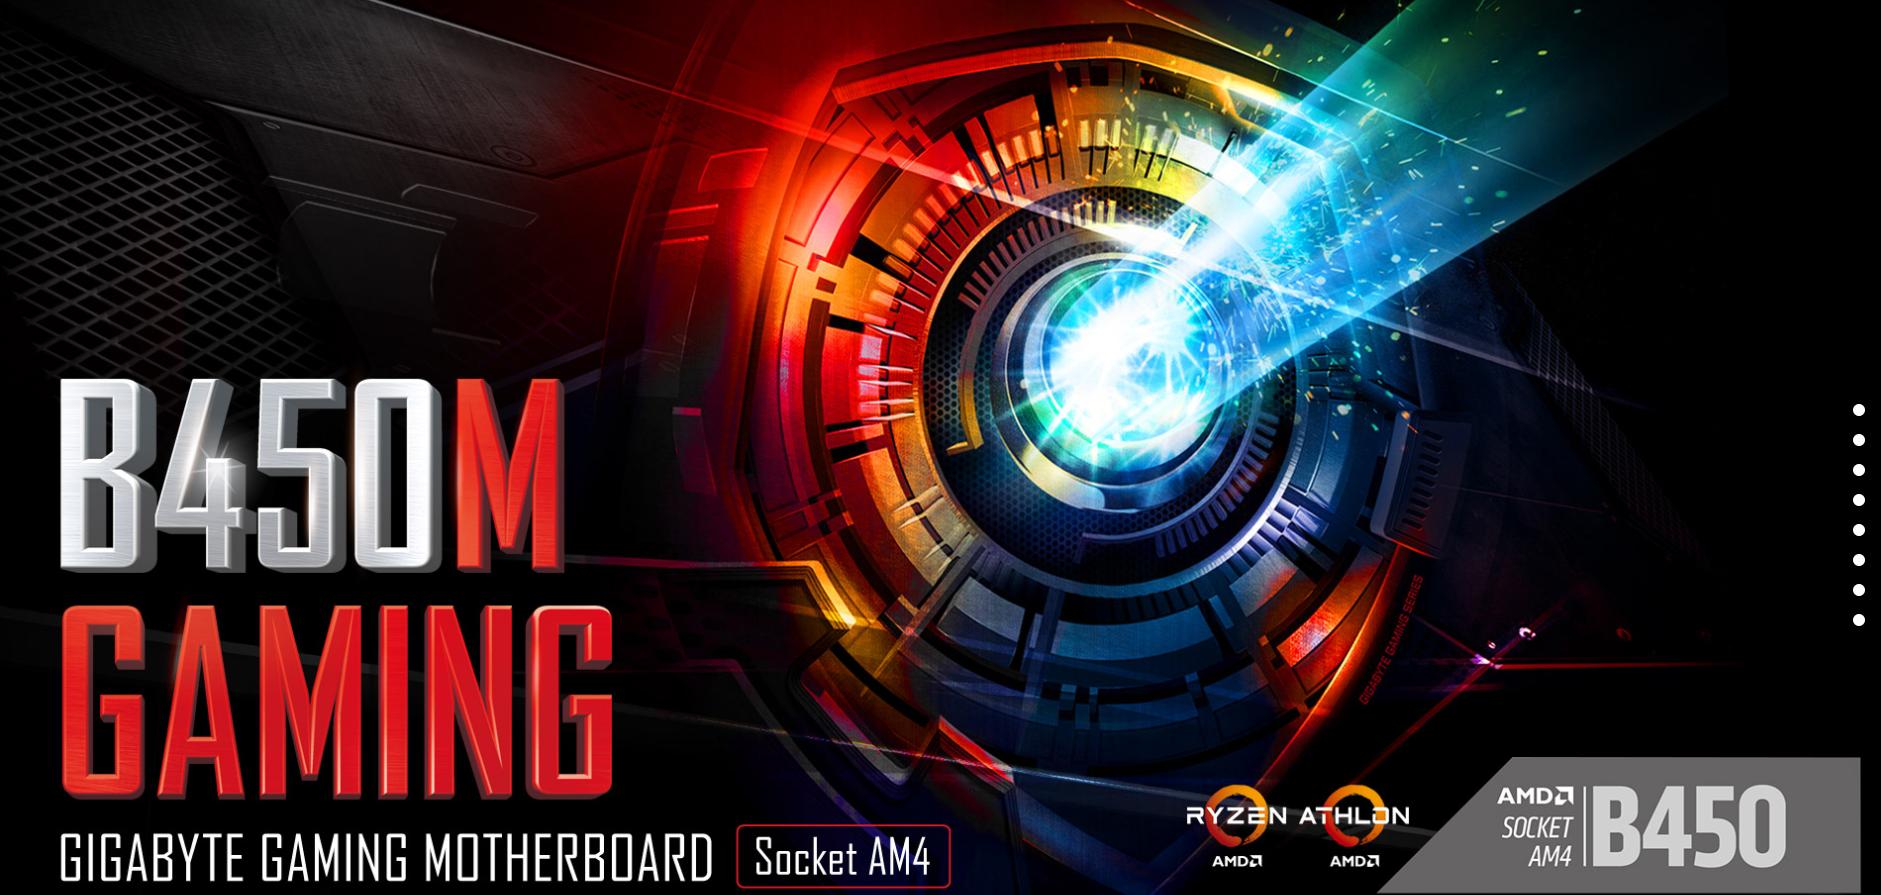 Gigabyte B450 M Gaming Motherboard